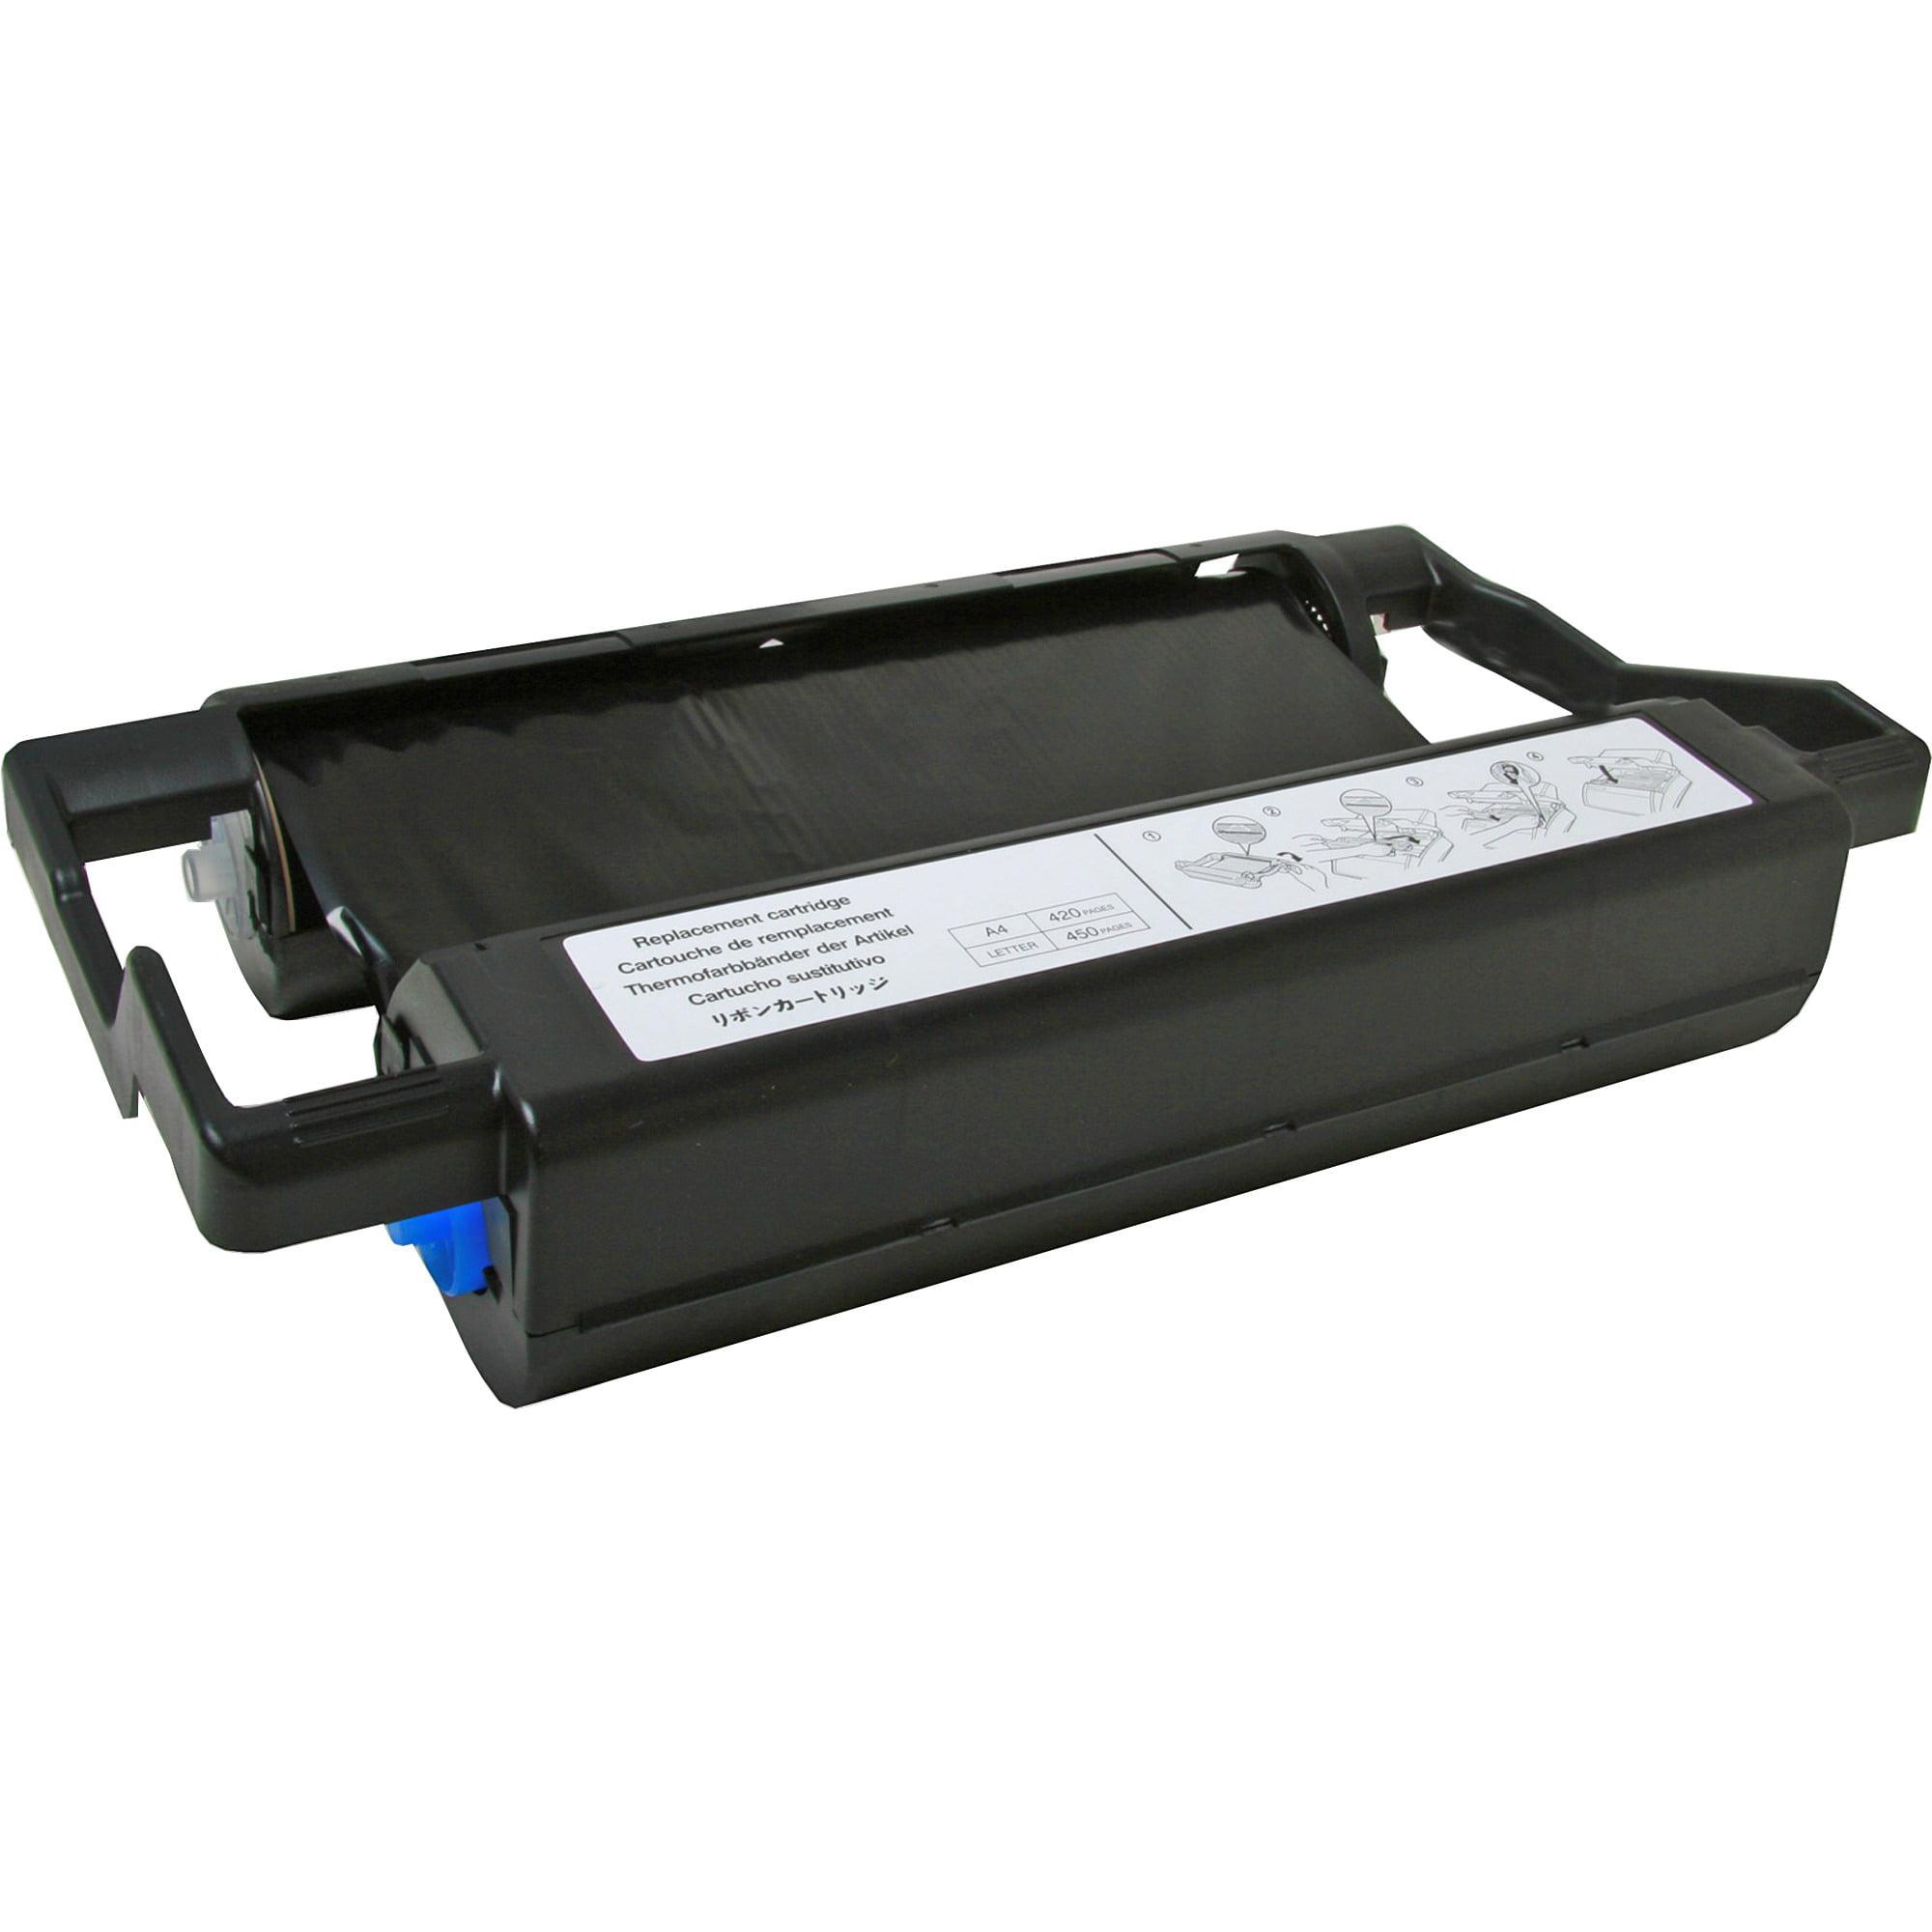 Elite Image, ELI75001, Remanufactured BRT PC201 Print Cartridge, 1 Each